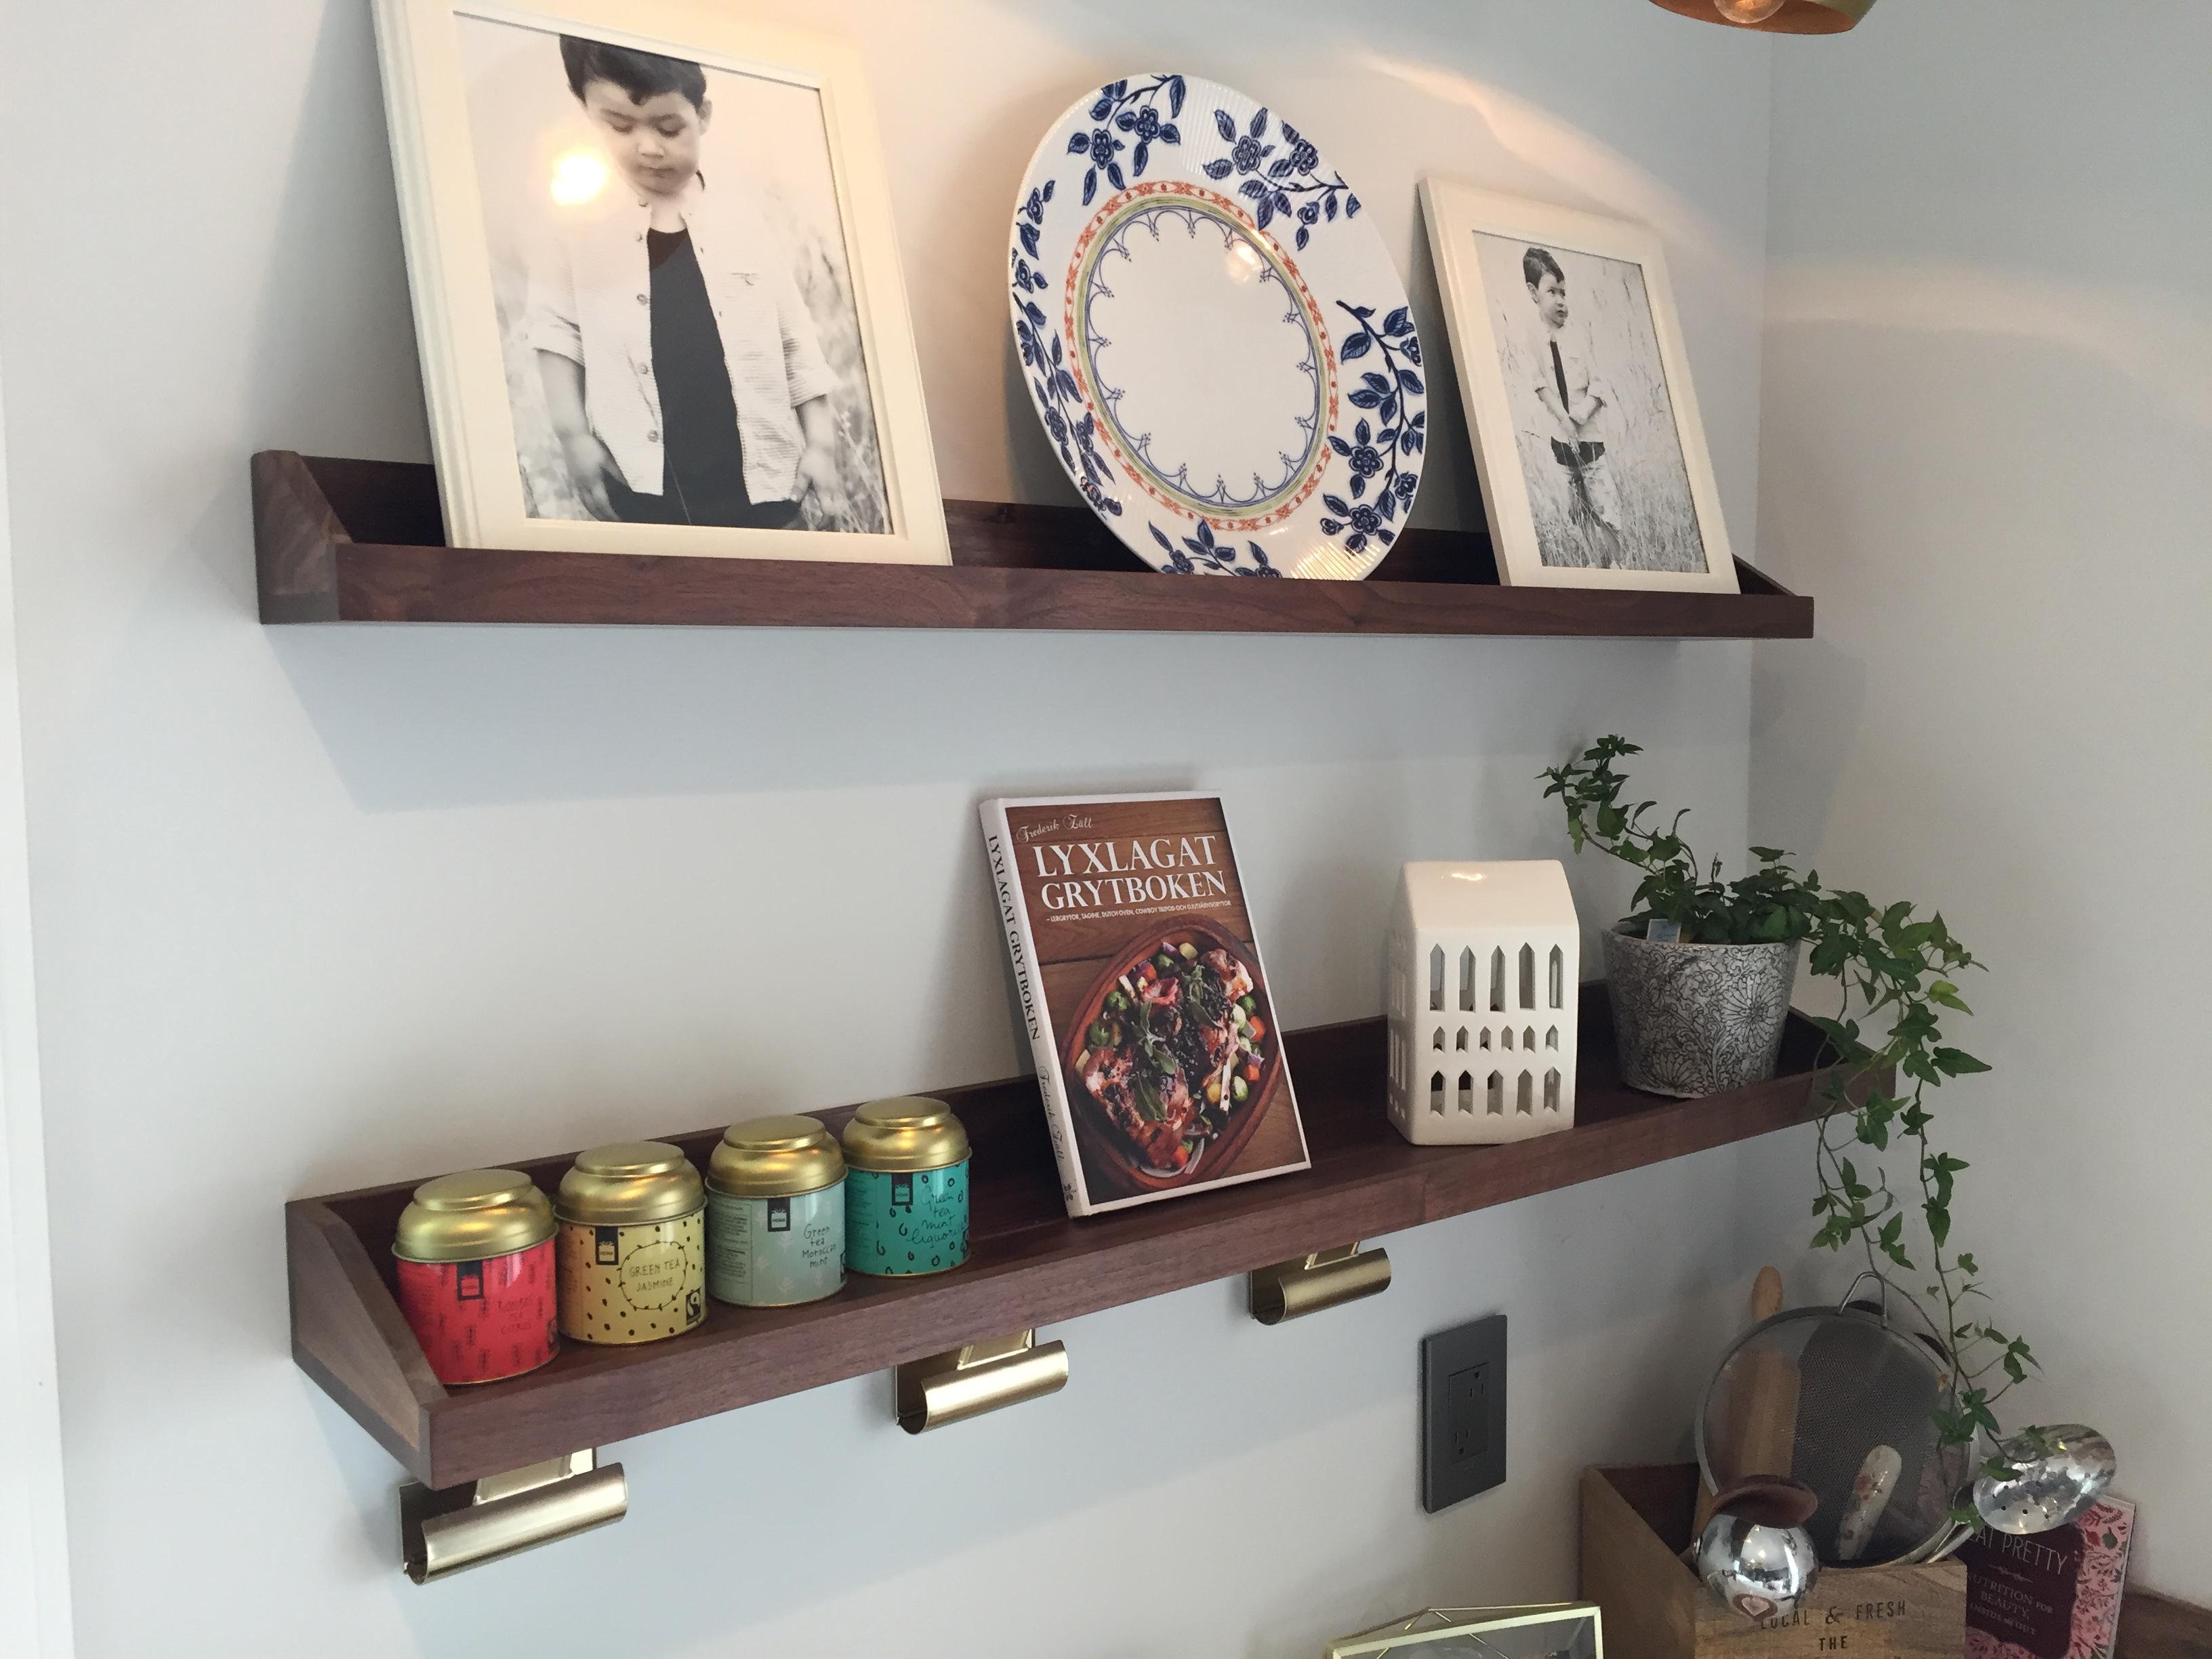 Walnut display shelves